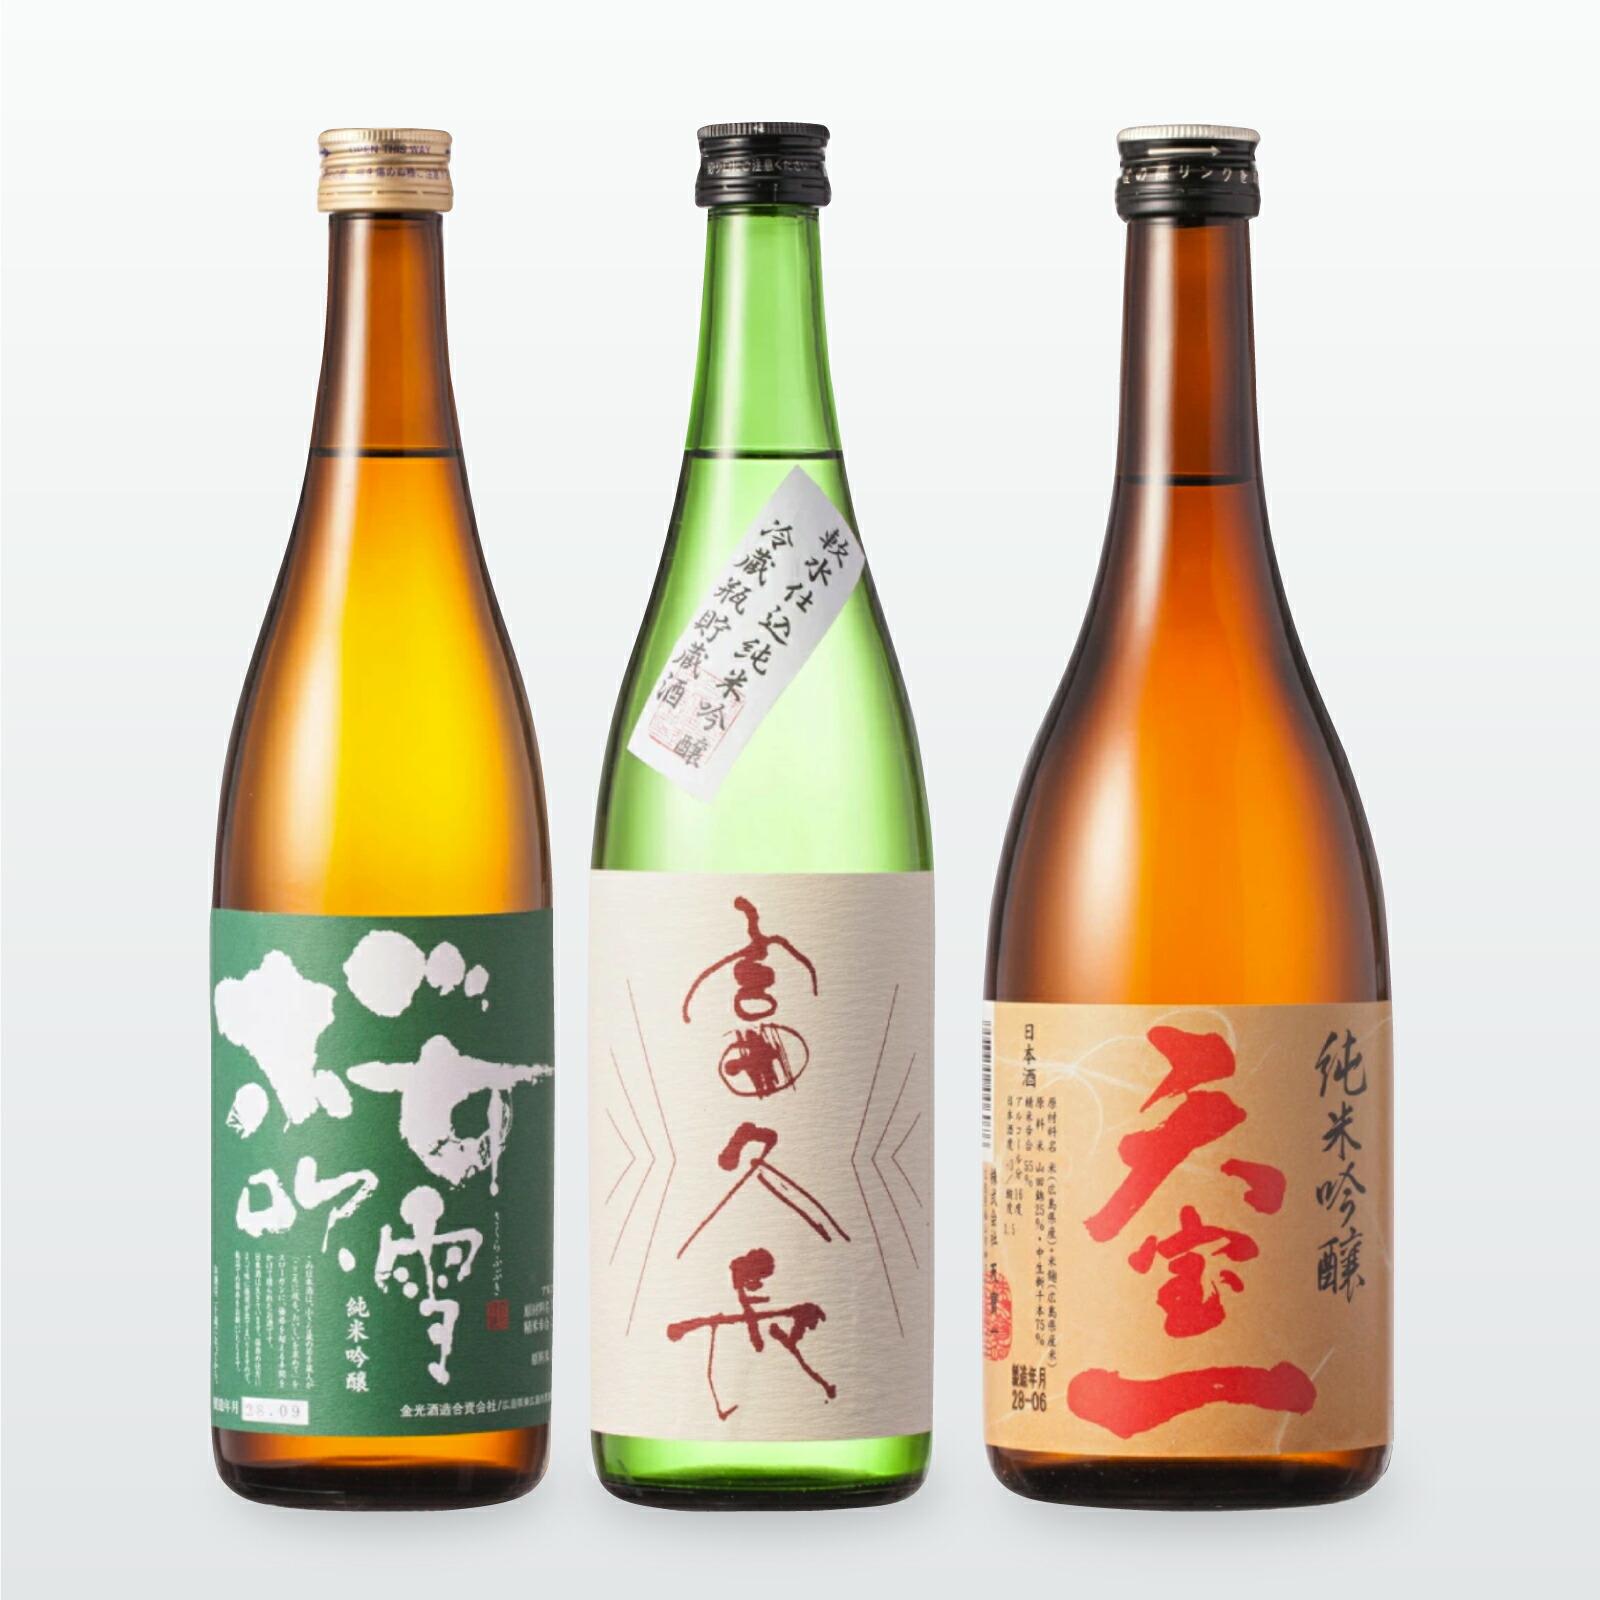 広島純米吟醸酒 贅沢晩酌3本セット